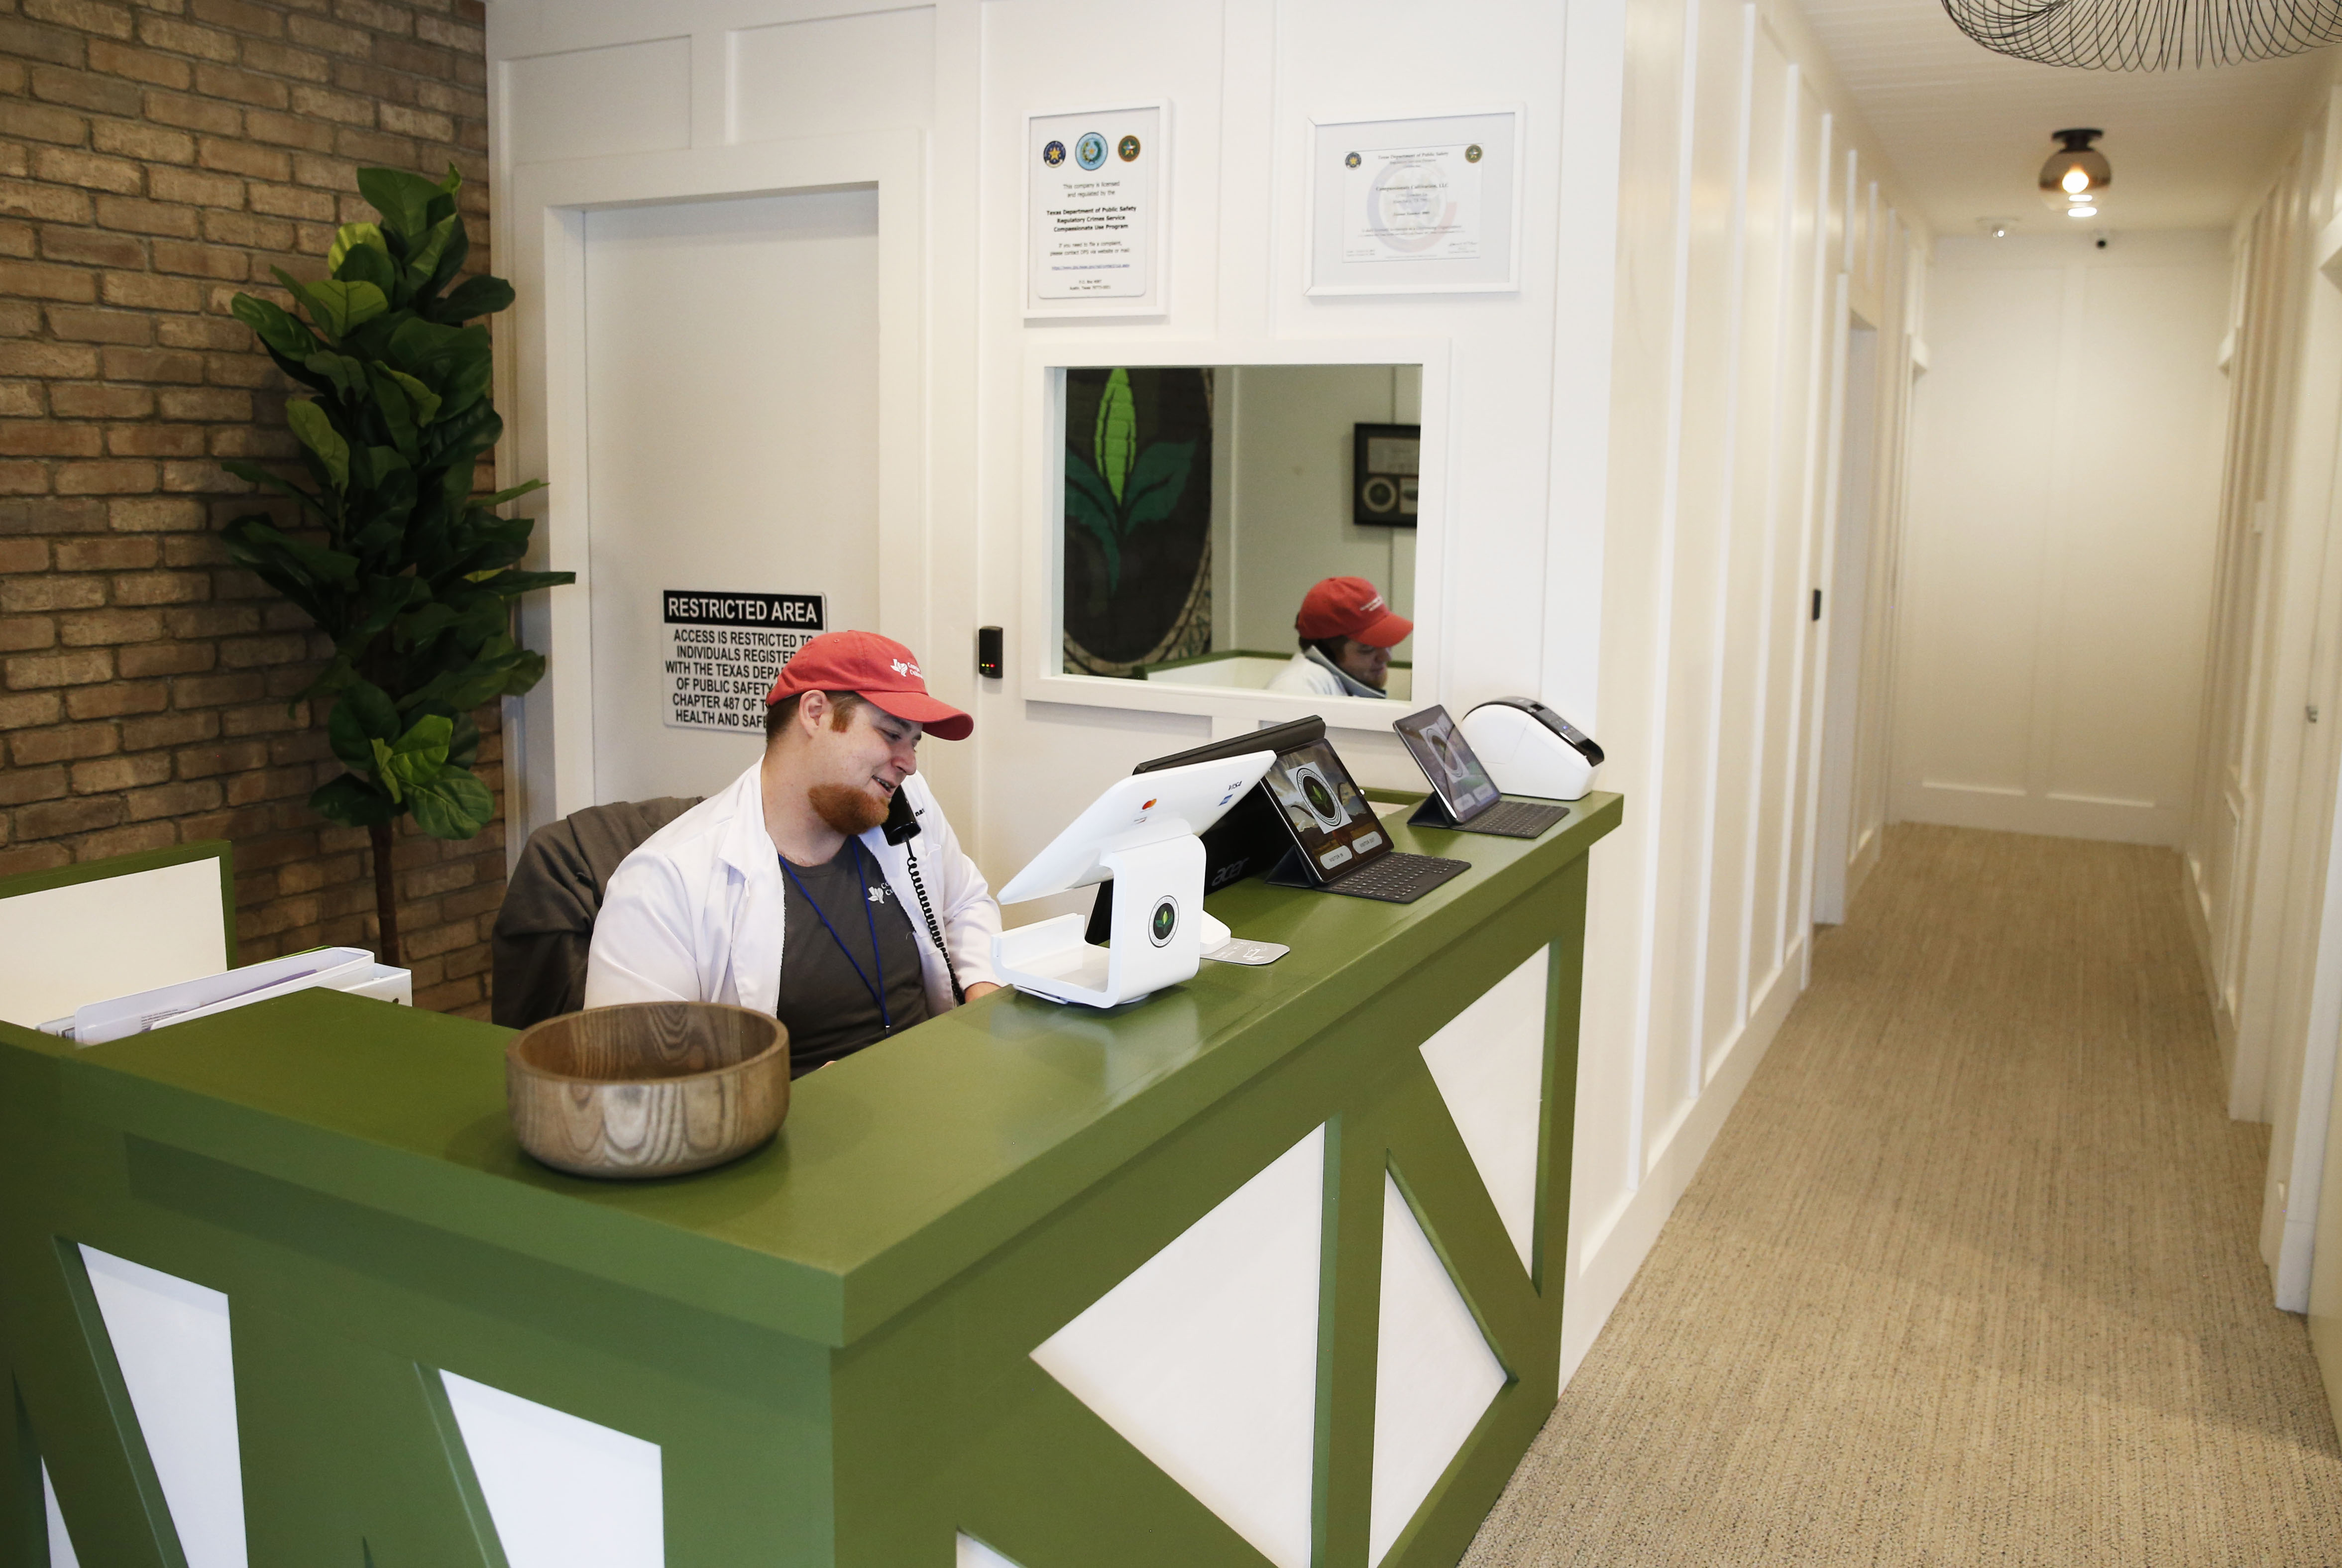 Texas' first cannabis dispensary has opened near Austin, but